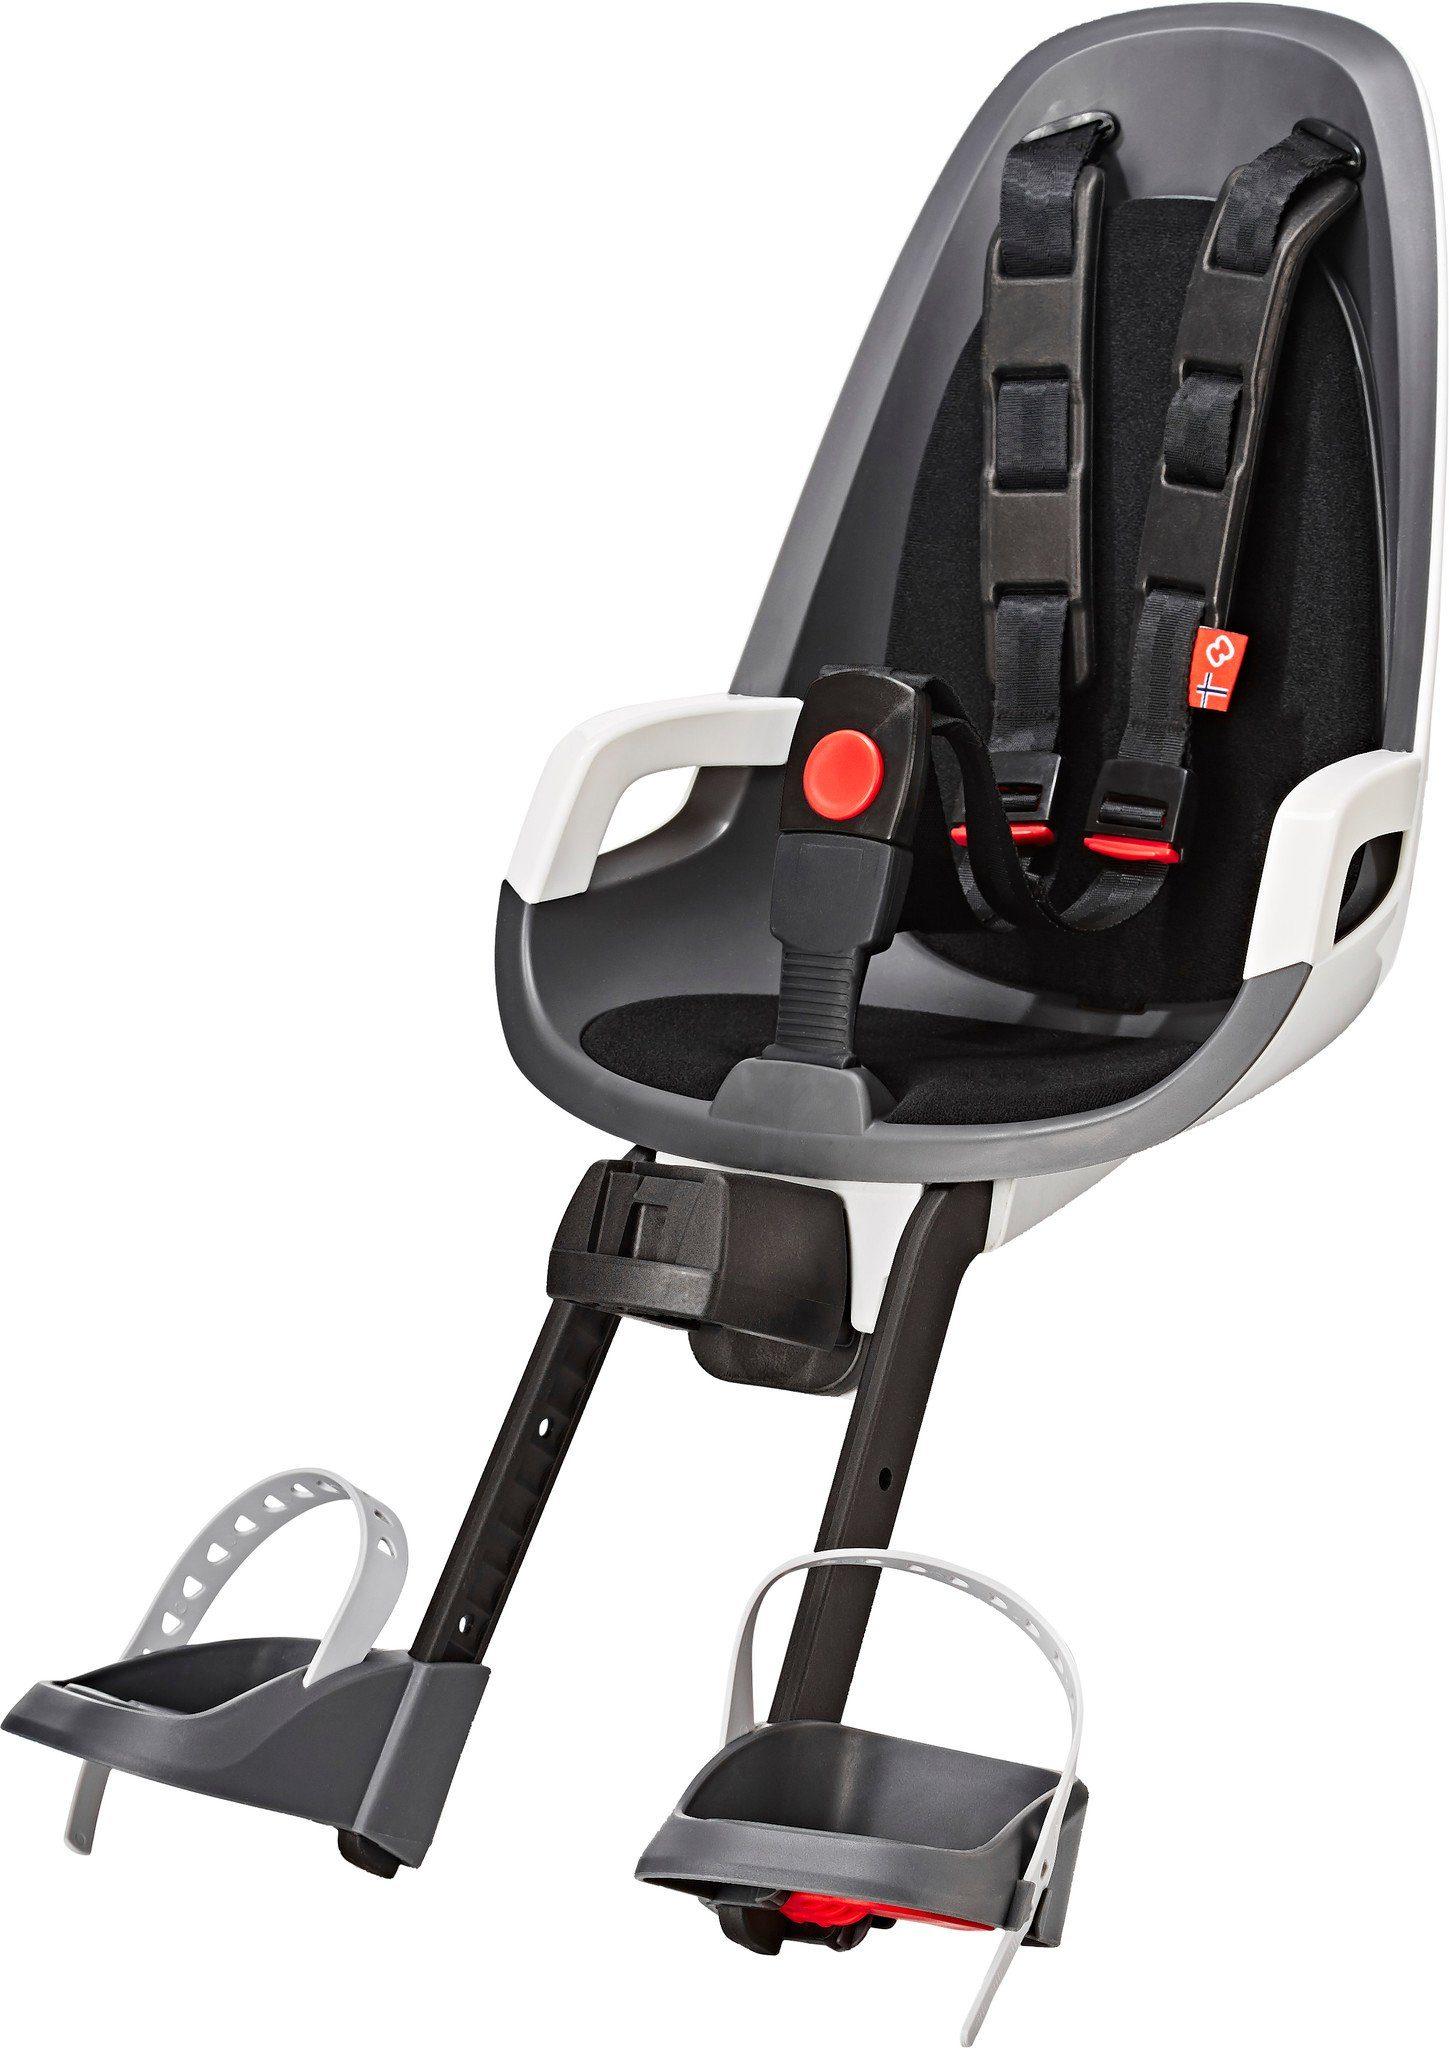 Hamax Kindersitz-System »Caress«